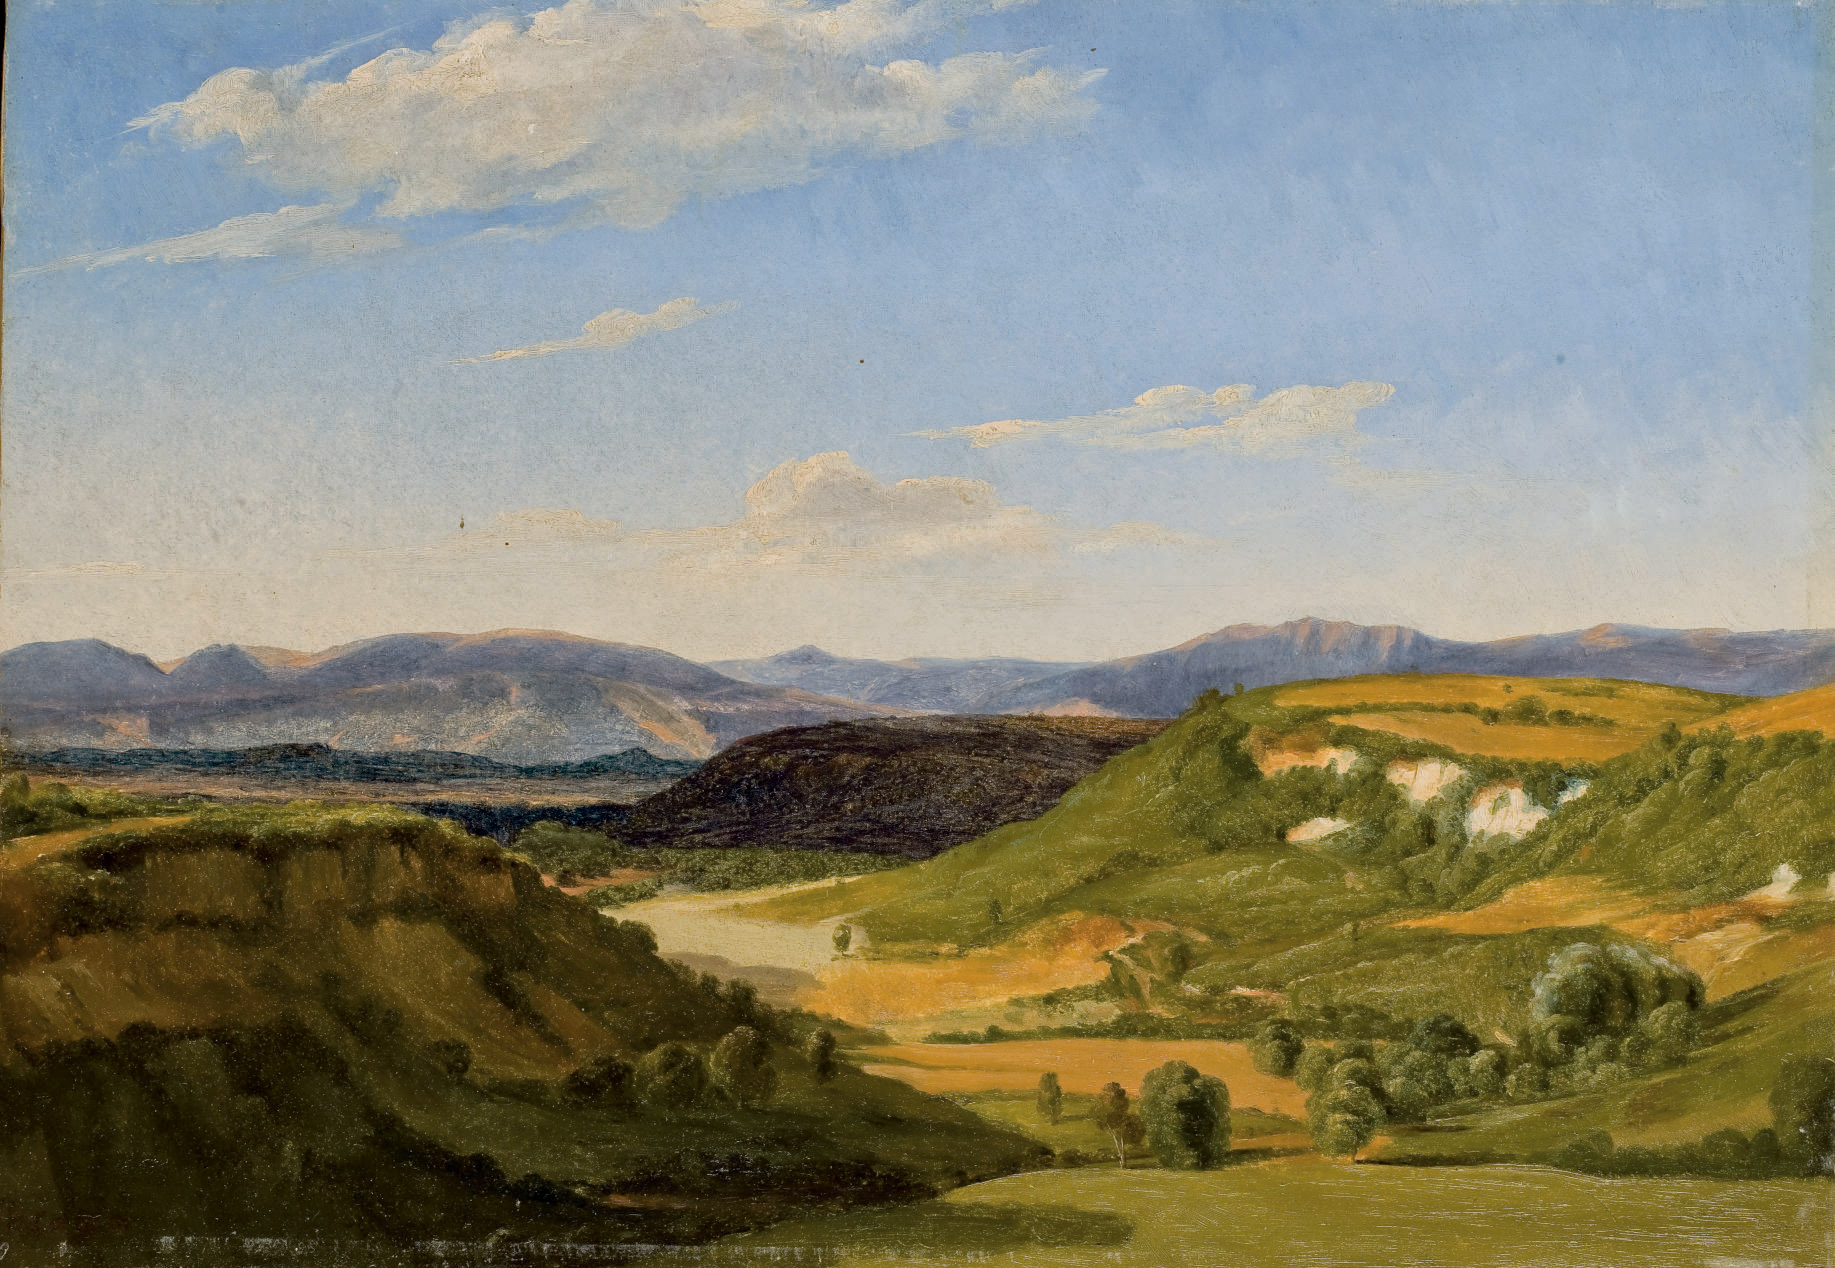 ANDRE GIROUX (PARIS 1801-1879)